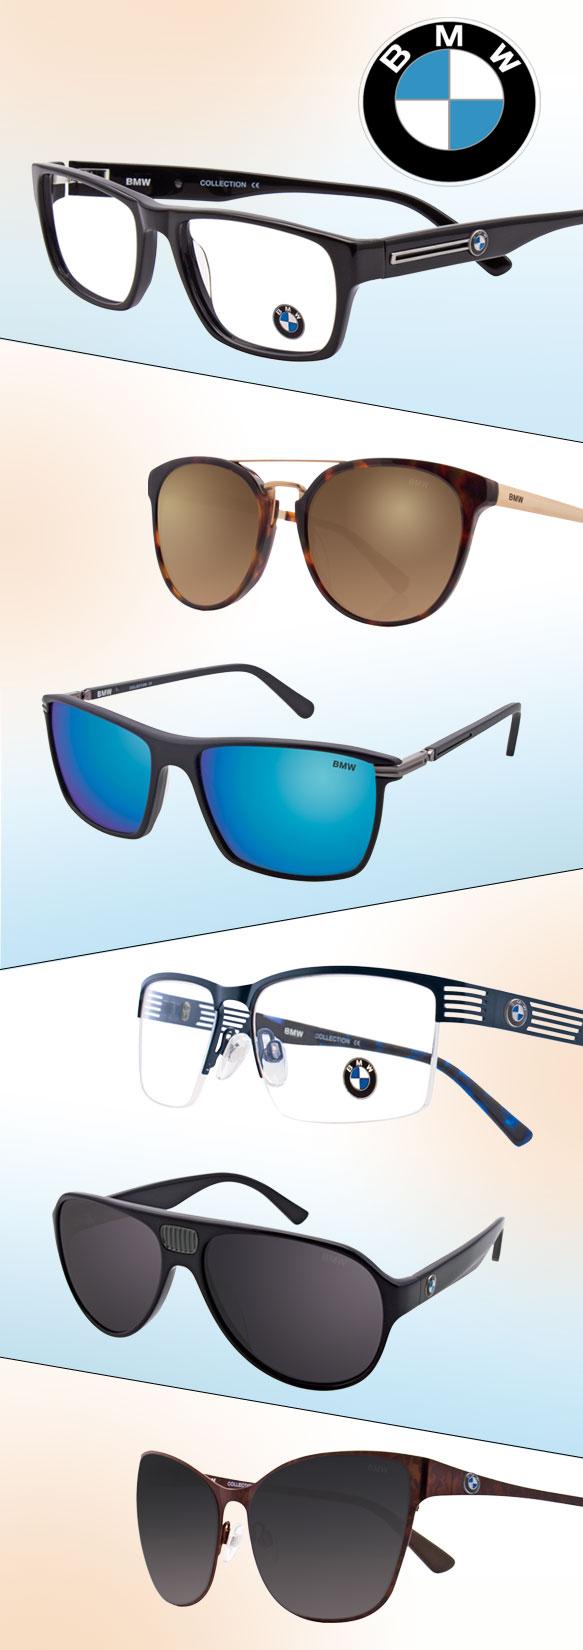 BMW Eyewear (B6014), BMW Eyewear (B6517), BMW Eyewear (B6515), BMW Eyewear (B6013), BMW Eyewear (B6512), BMW Eyewear (B6514)